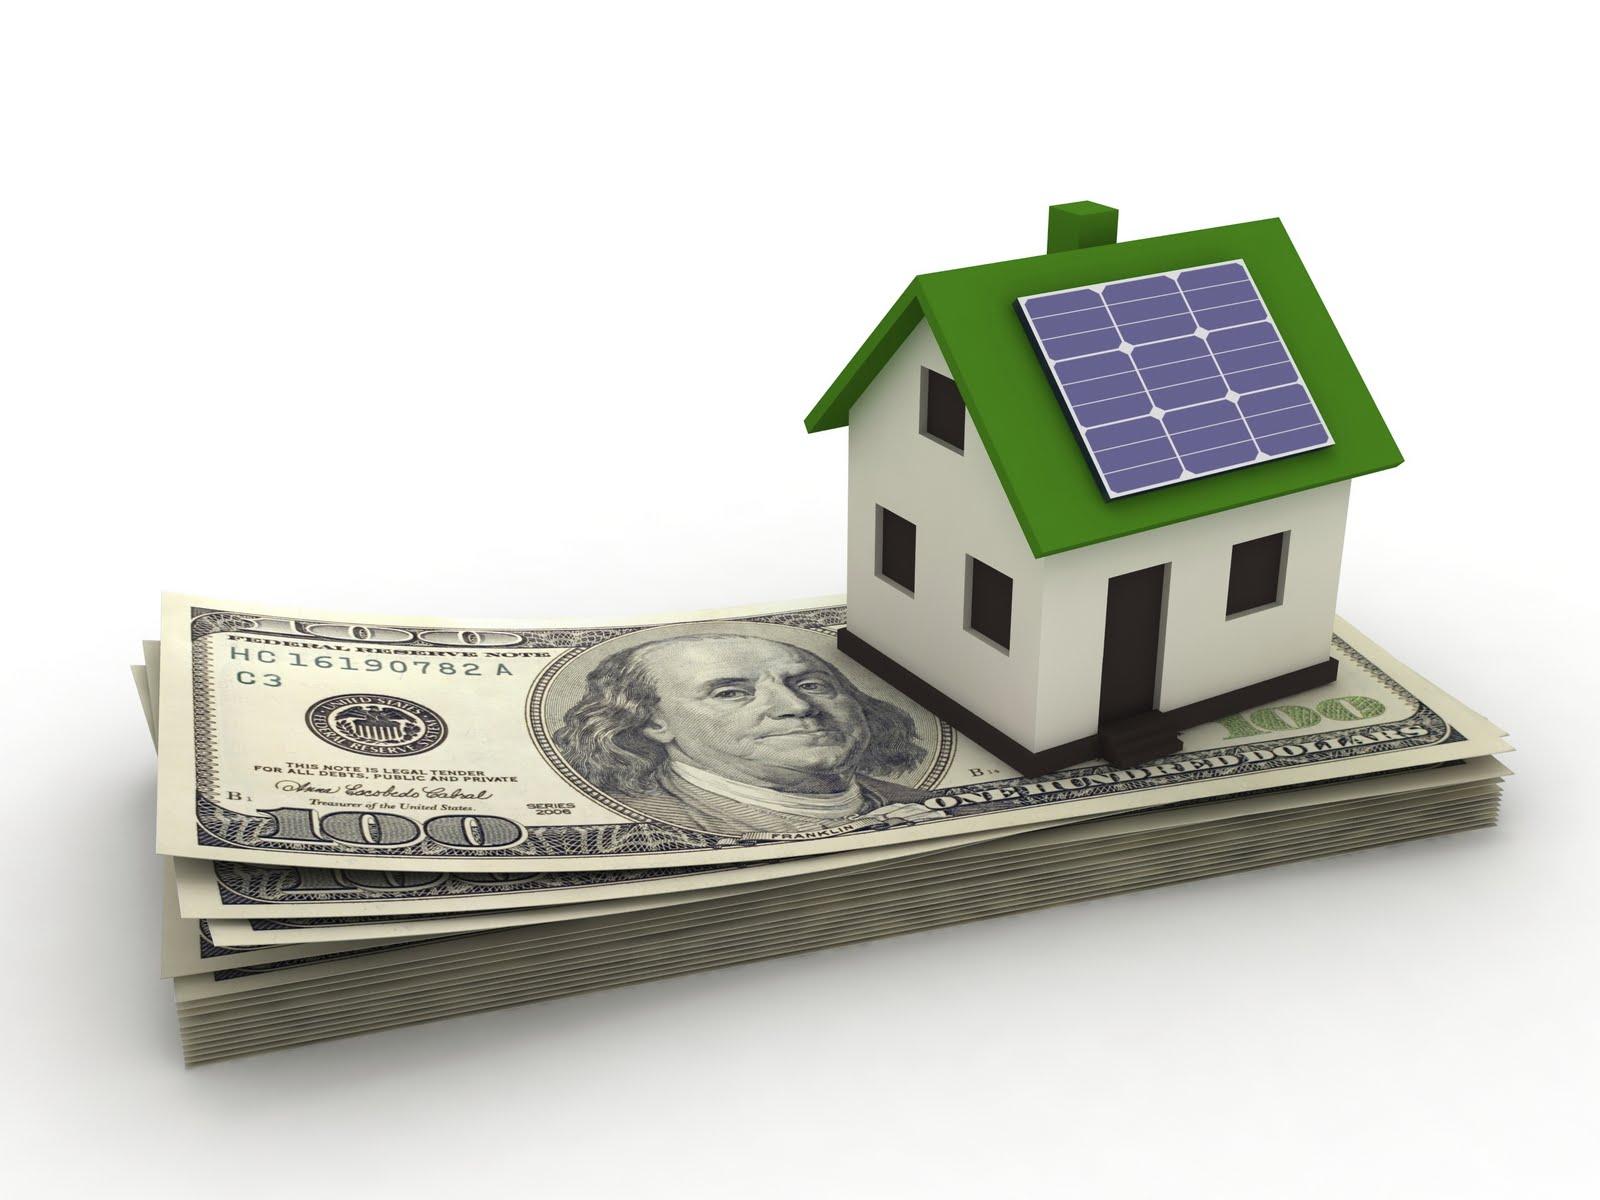 Green blog: Learn Solar power systems au #40751A